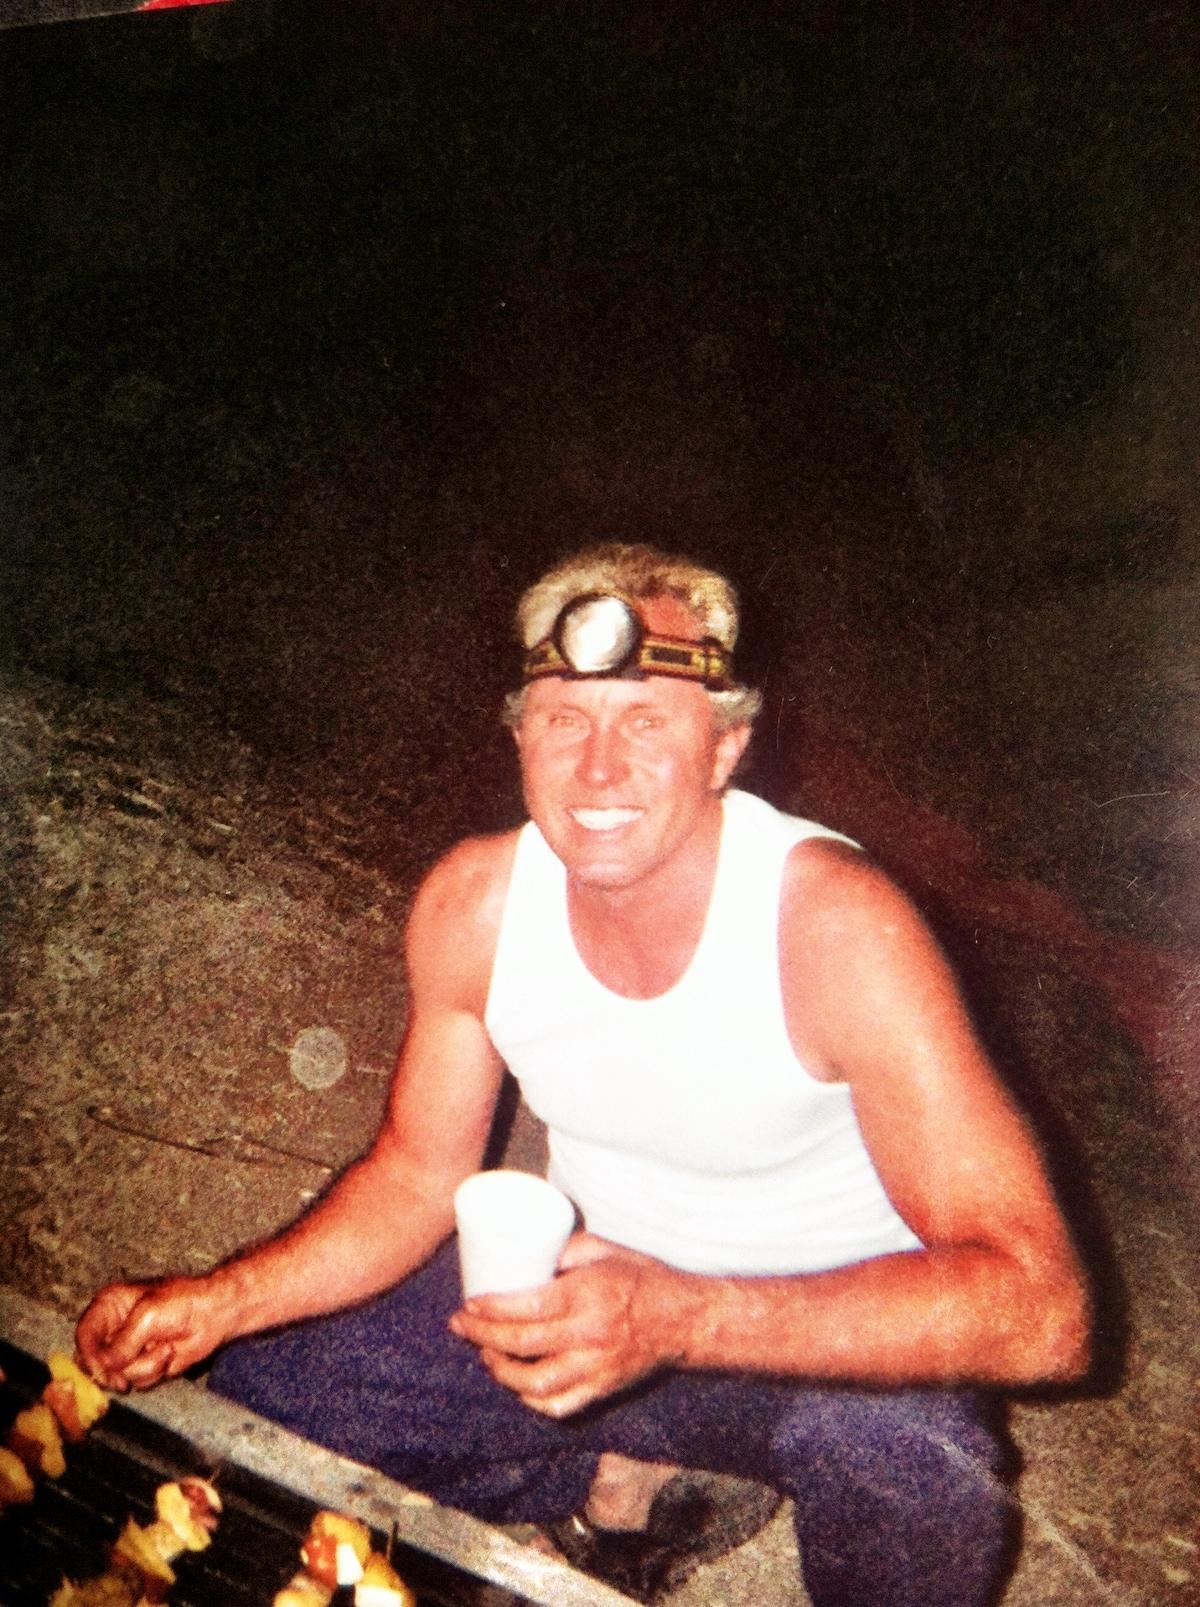 Darrell from Topanga Canyon